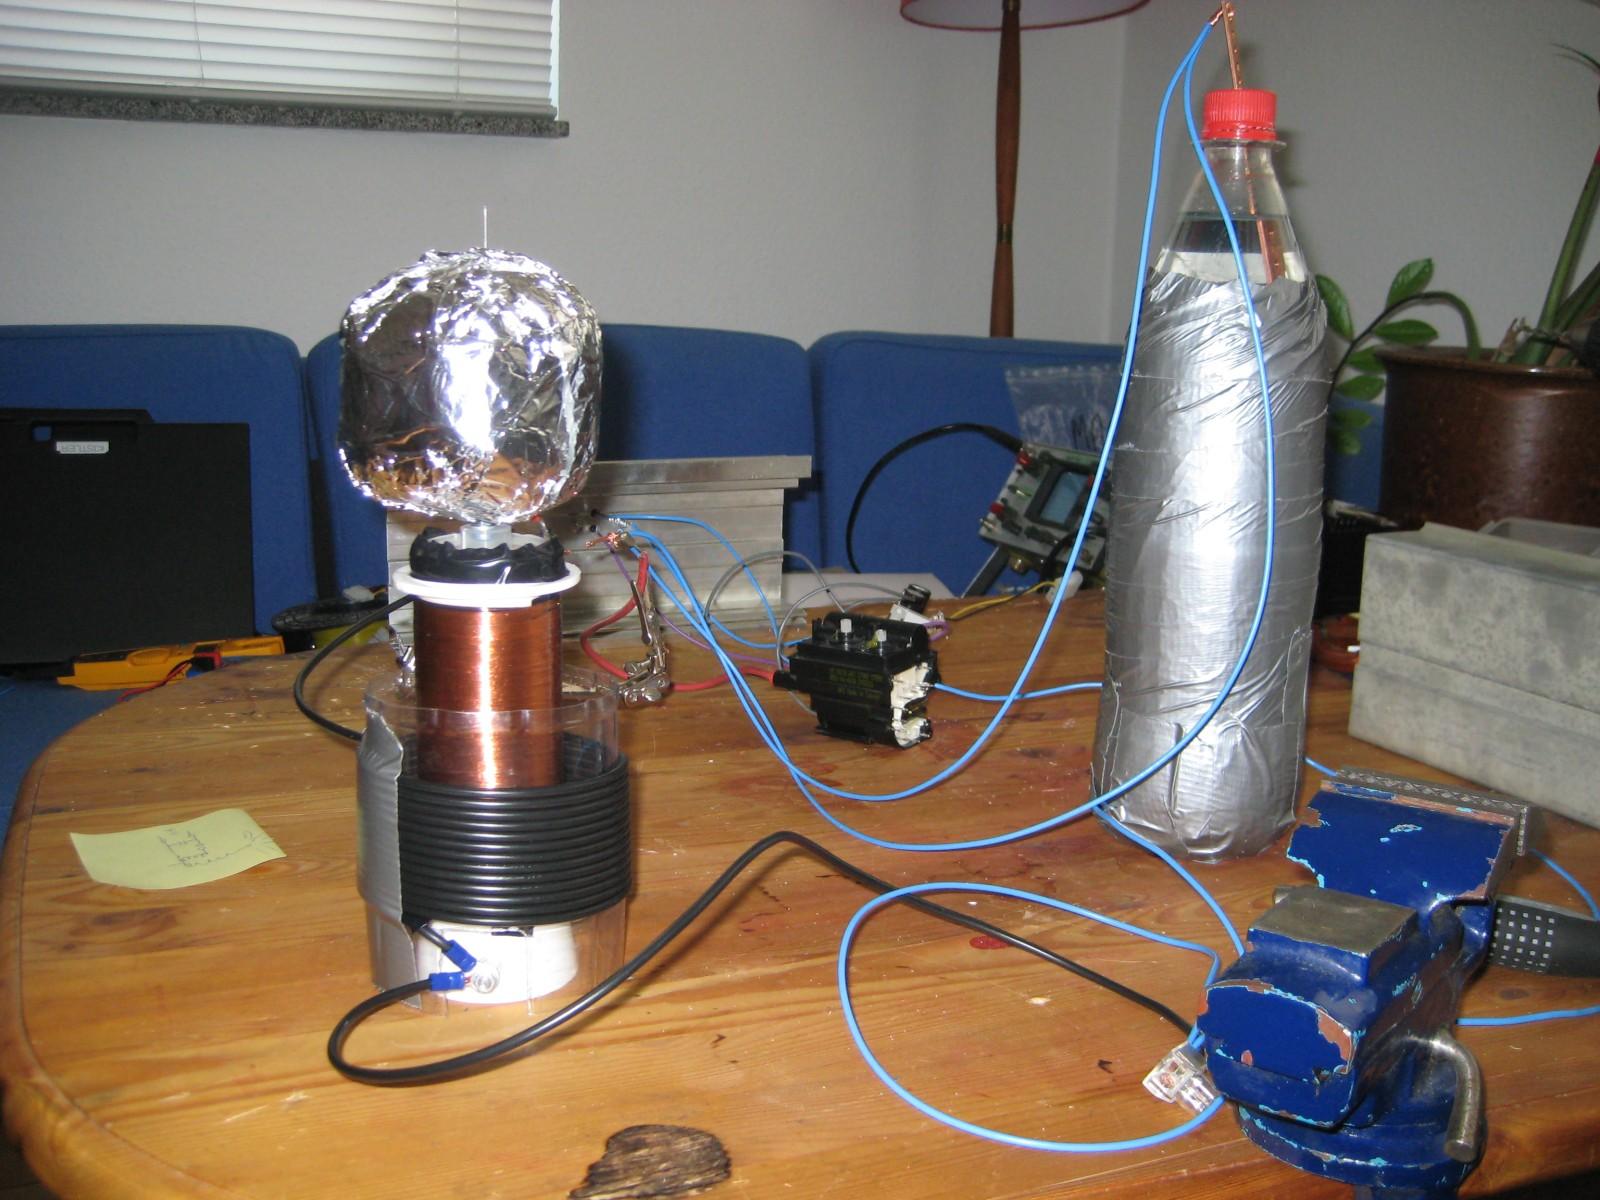 Kaizer Sgtc I Power Electronics Plasma Ball Driver Schematic Img 0465